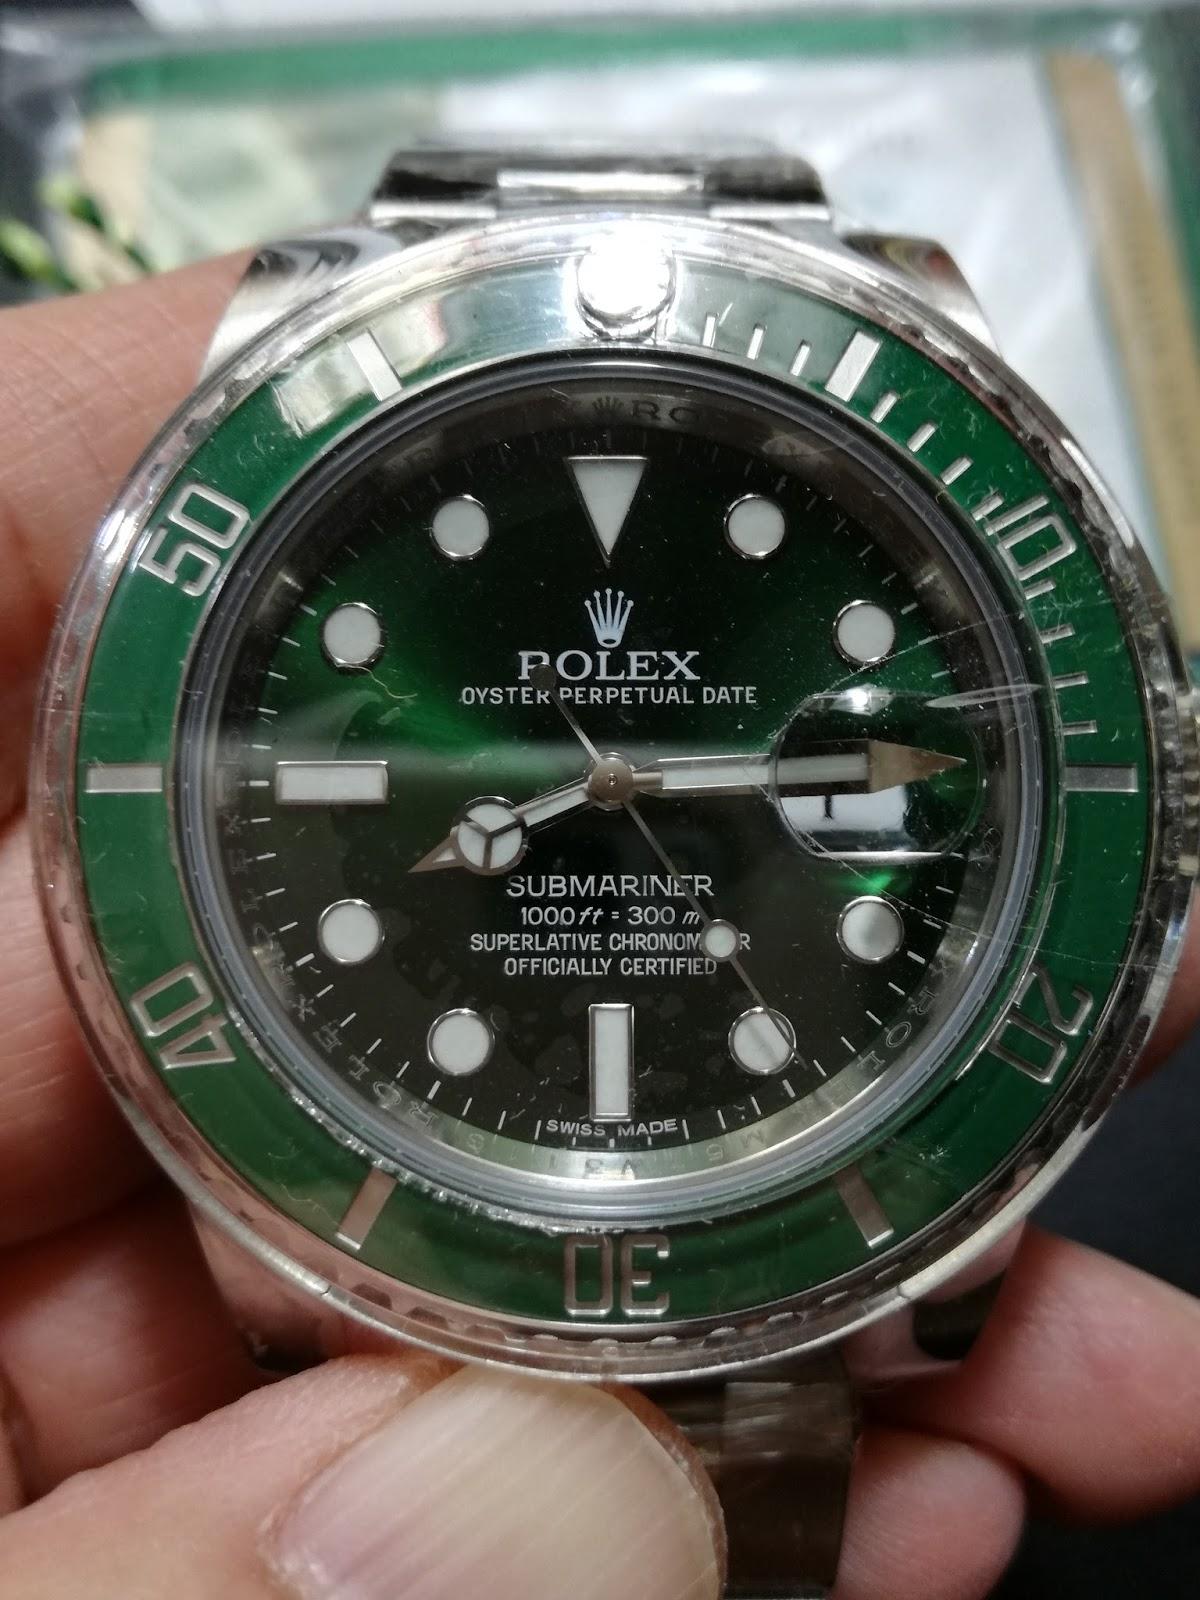 c249f1bed1e Rolex Submariner ref 116610LV Hulk and Submariner Black Market trend.